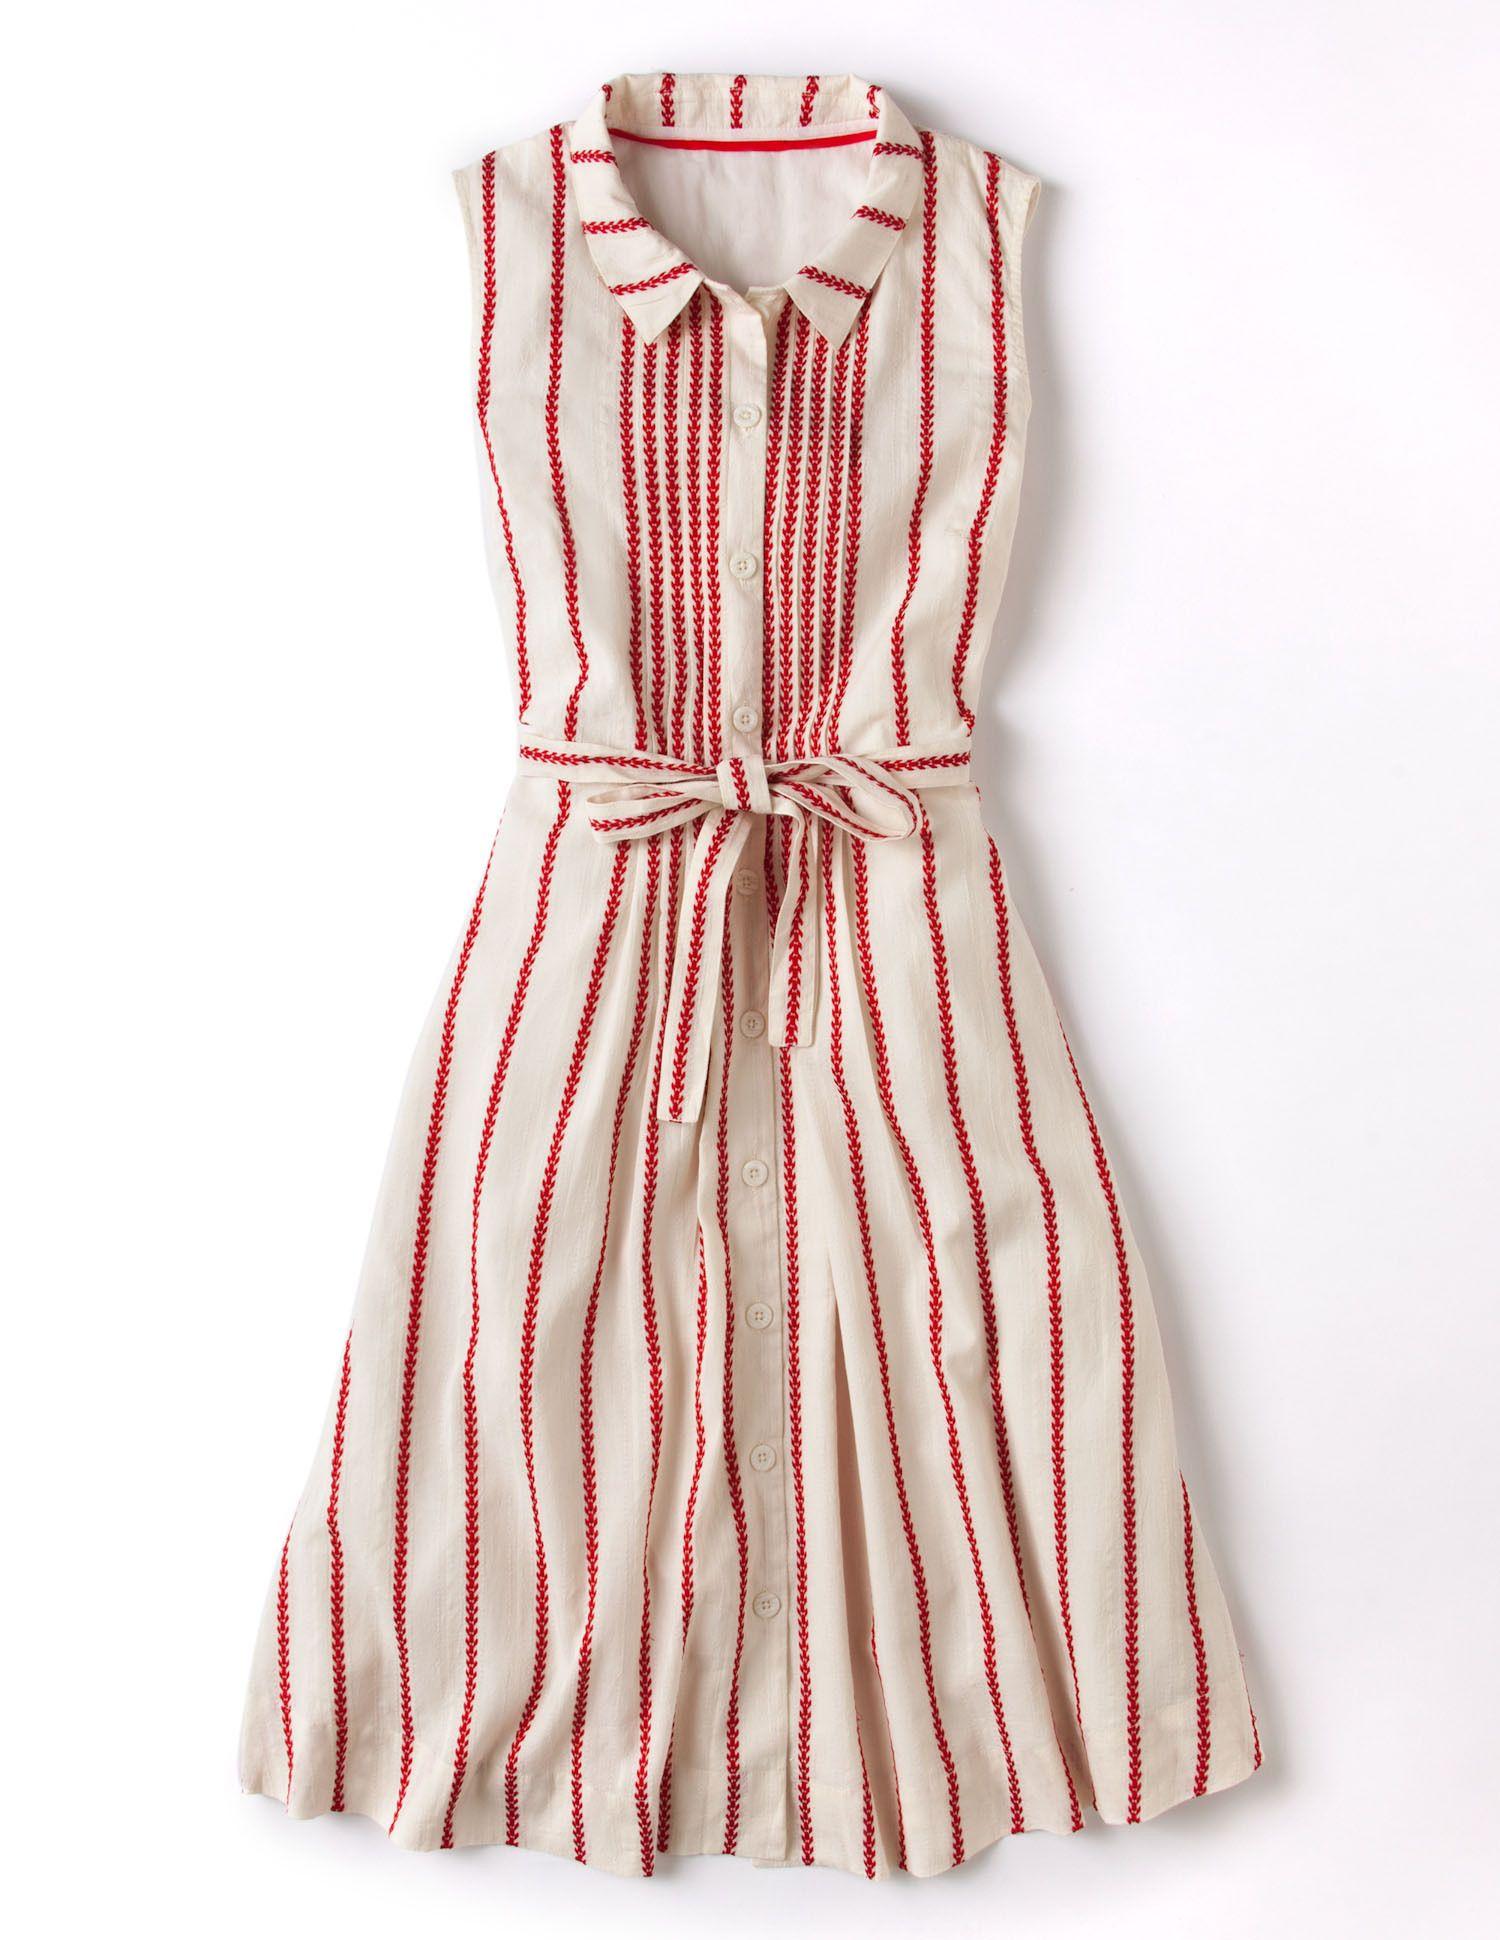 Boden dress, easy summer. | Fashion/Clothes | Pinterest | Domingo ...